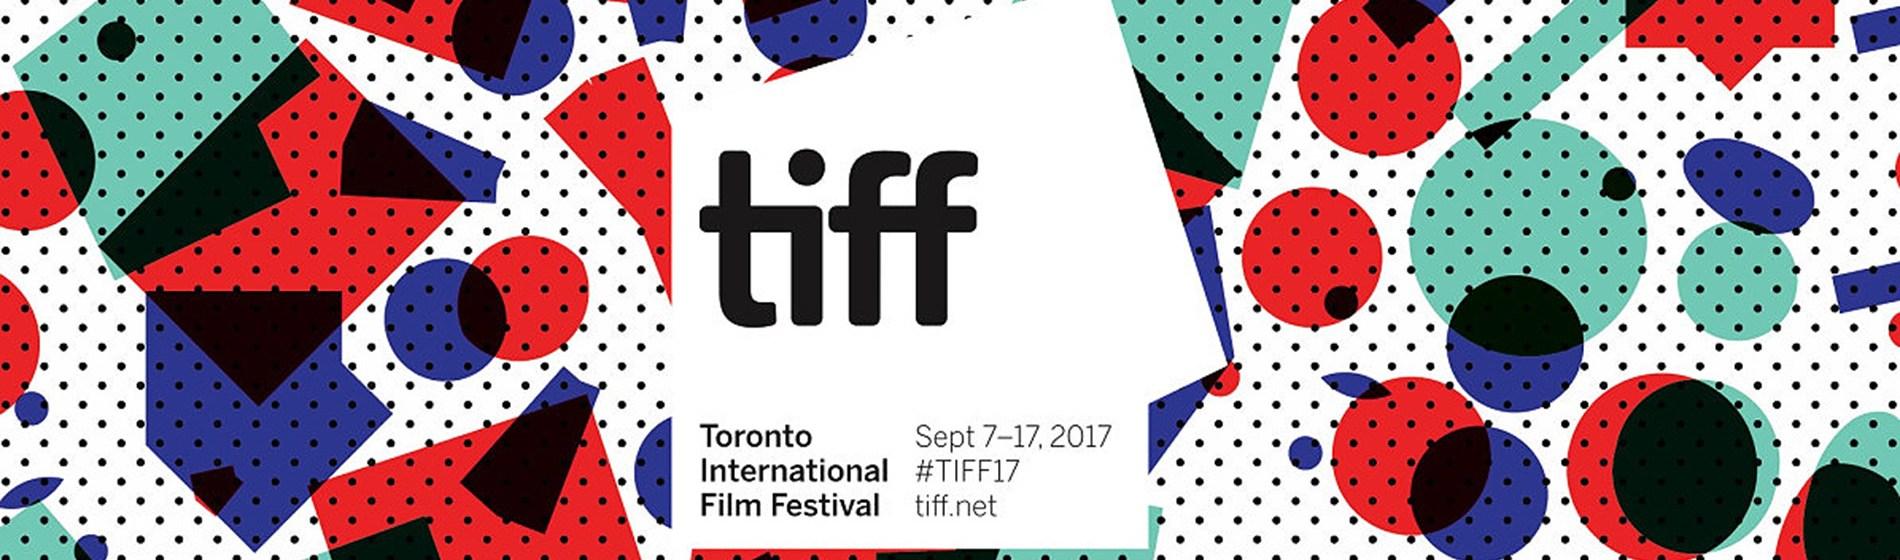 TIFF 2017 Guide